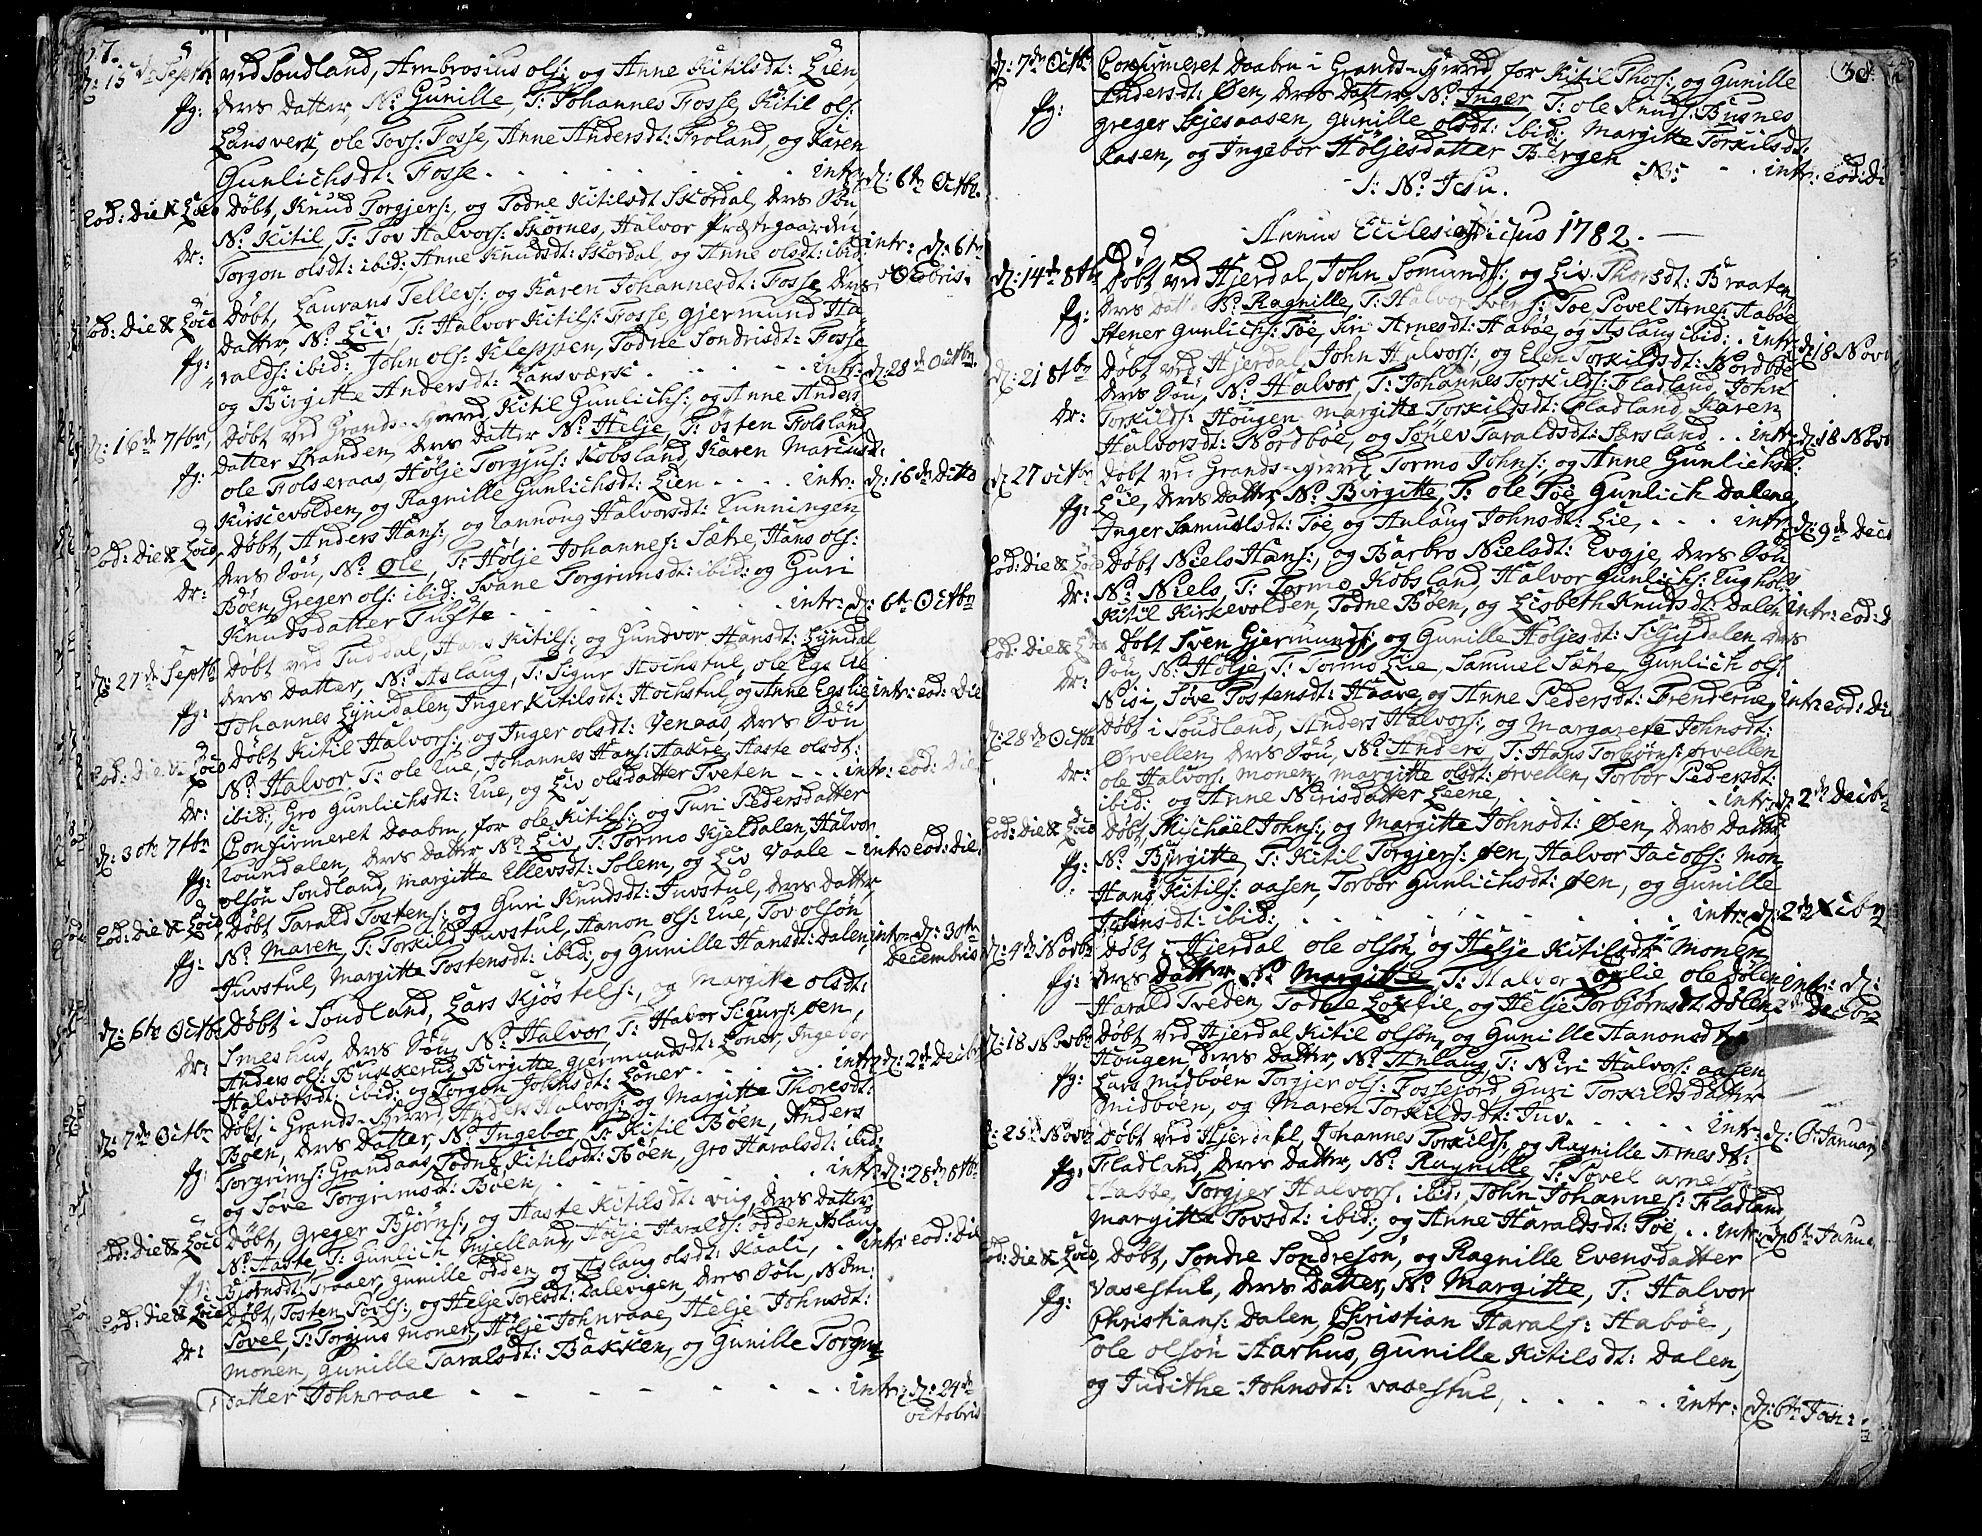 SAKO, Hjartdal kirkebøker, F/Fa/L0005: Ministerialbok nr. I 5, 1776-1801, s. 37-38